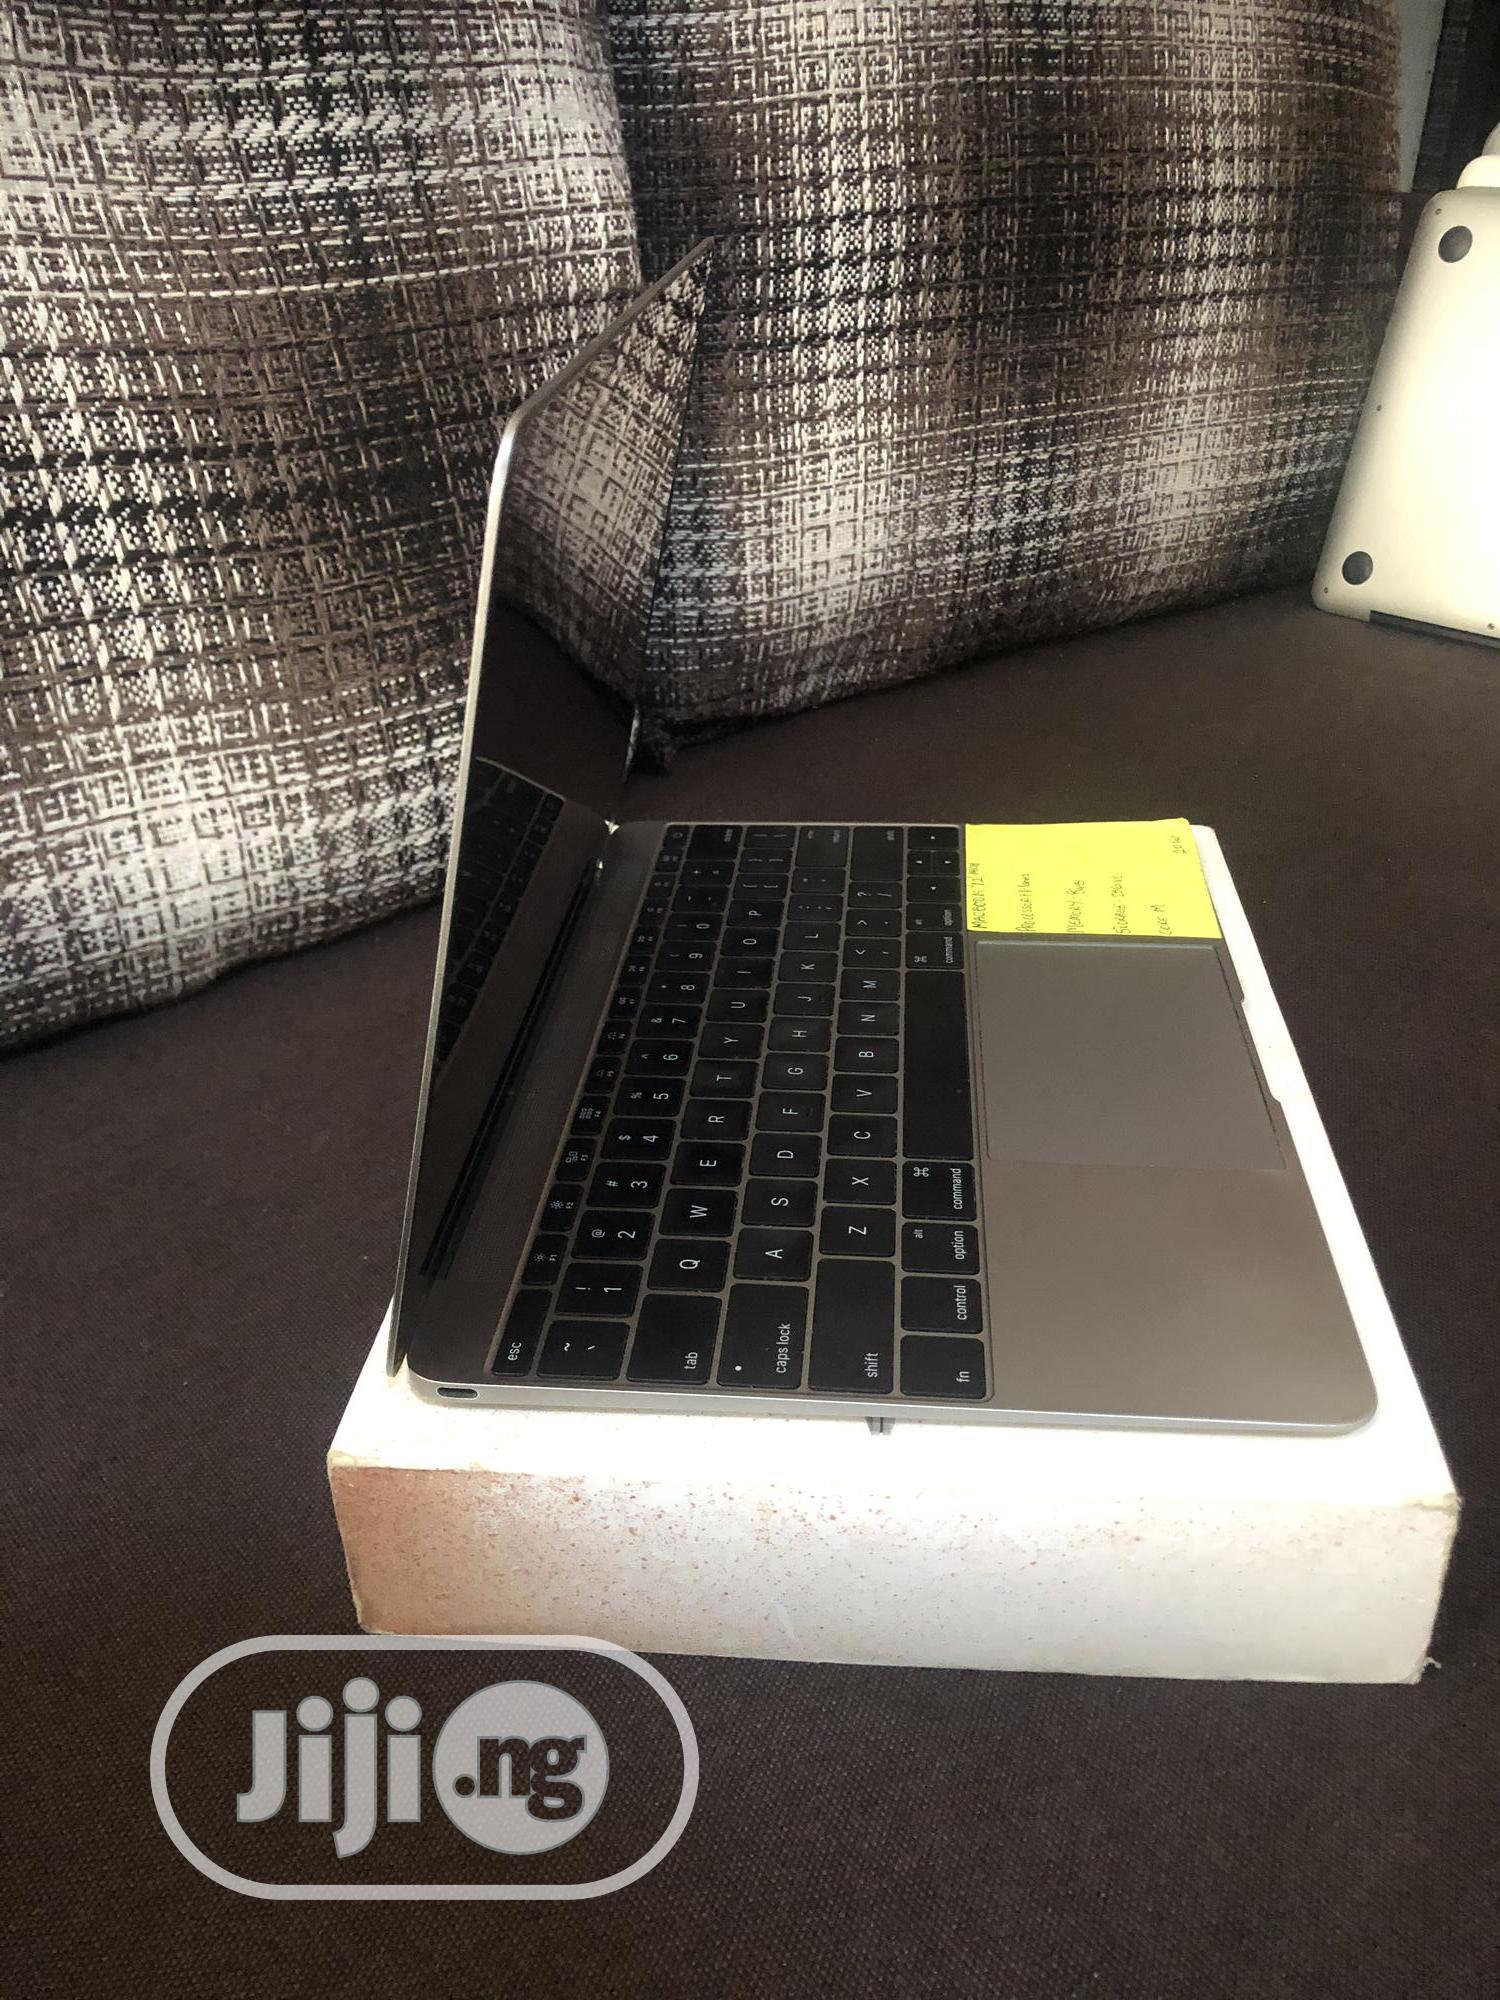 Laptop Apple MacBook 8GB Intel Core M SSD 256GB | Laptops & Computers for sale in Ajah, Lagos State, Nigeria